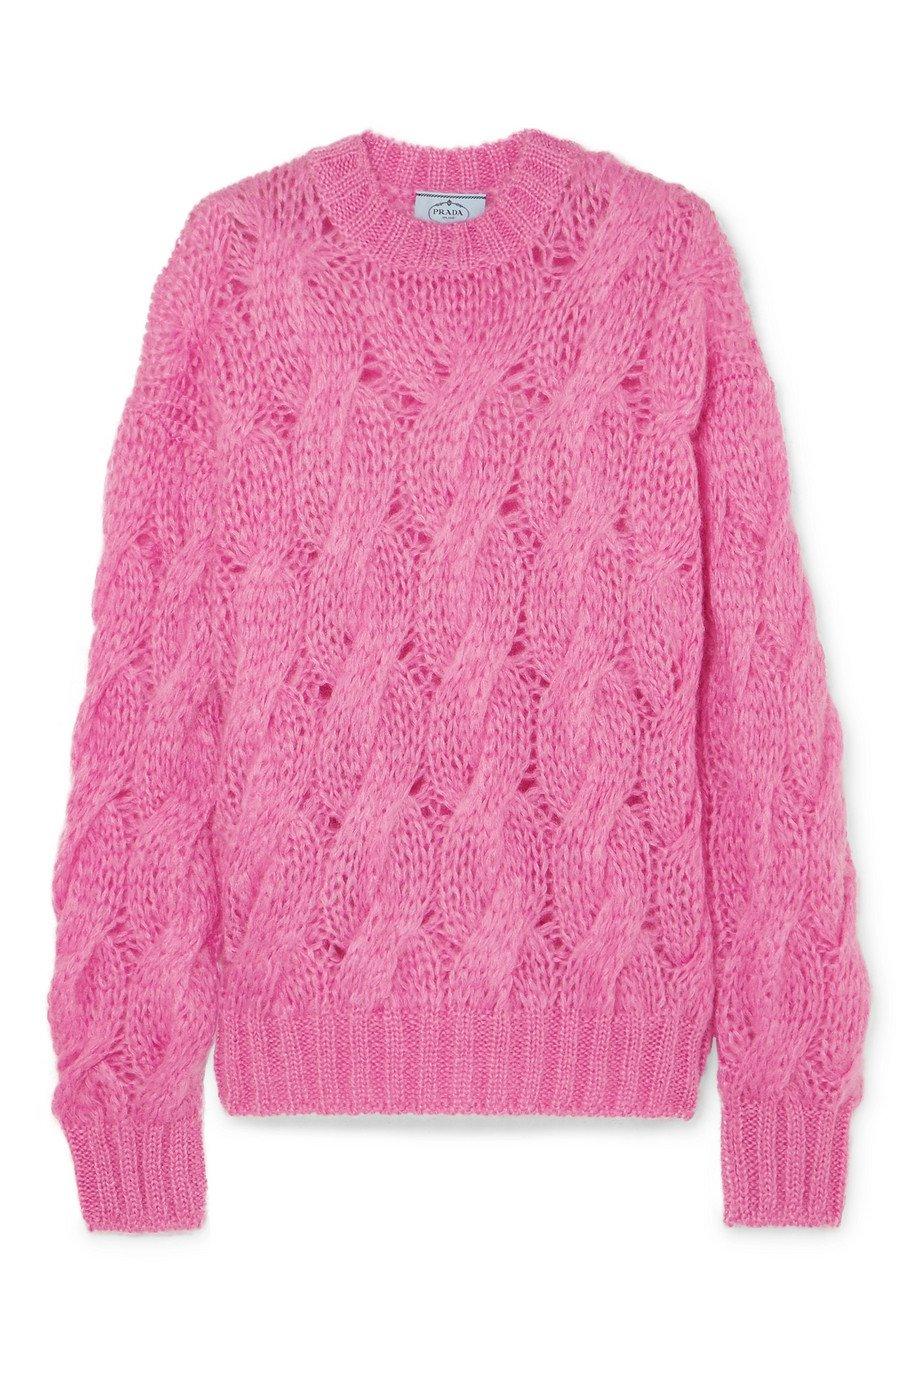 Prada   Cable-knit mohair-blend sweater   NET-A-PORTER.COM